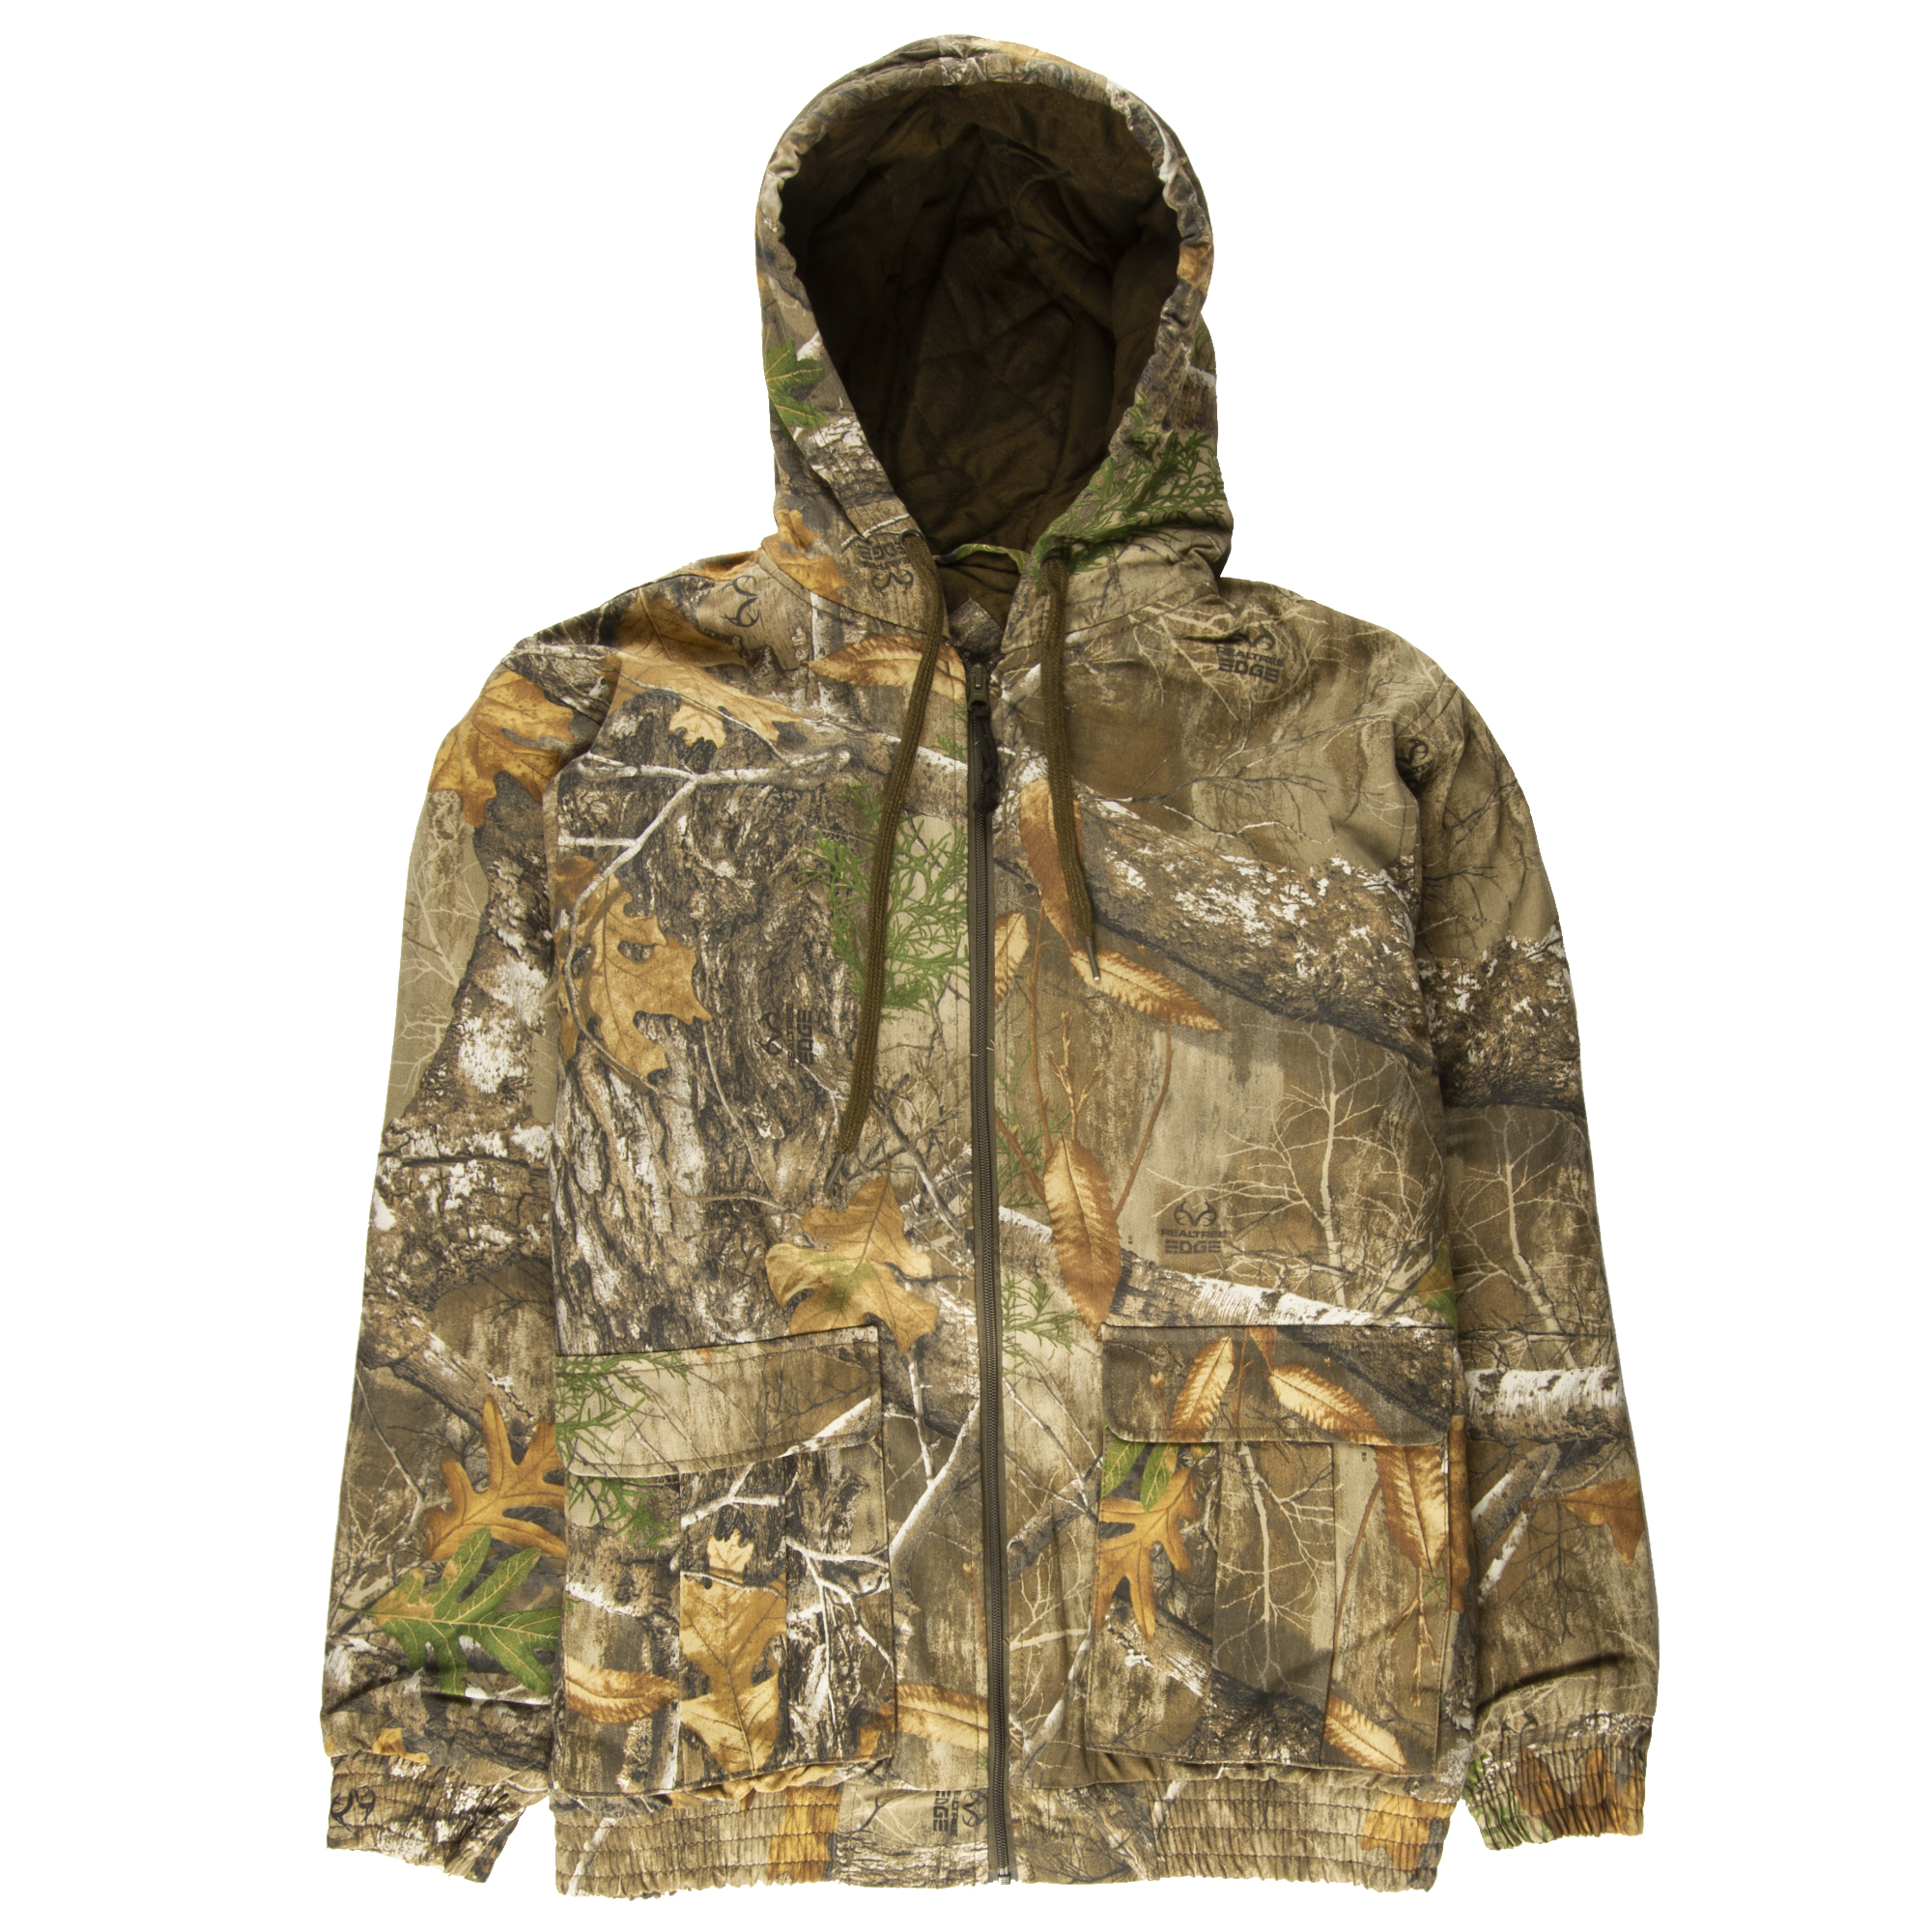 Hunter's Choice Men's Gritty Insulated Jacket, Realtree Edge Camo